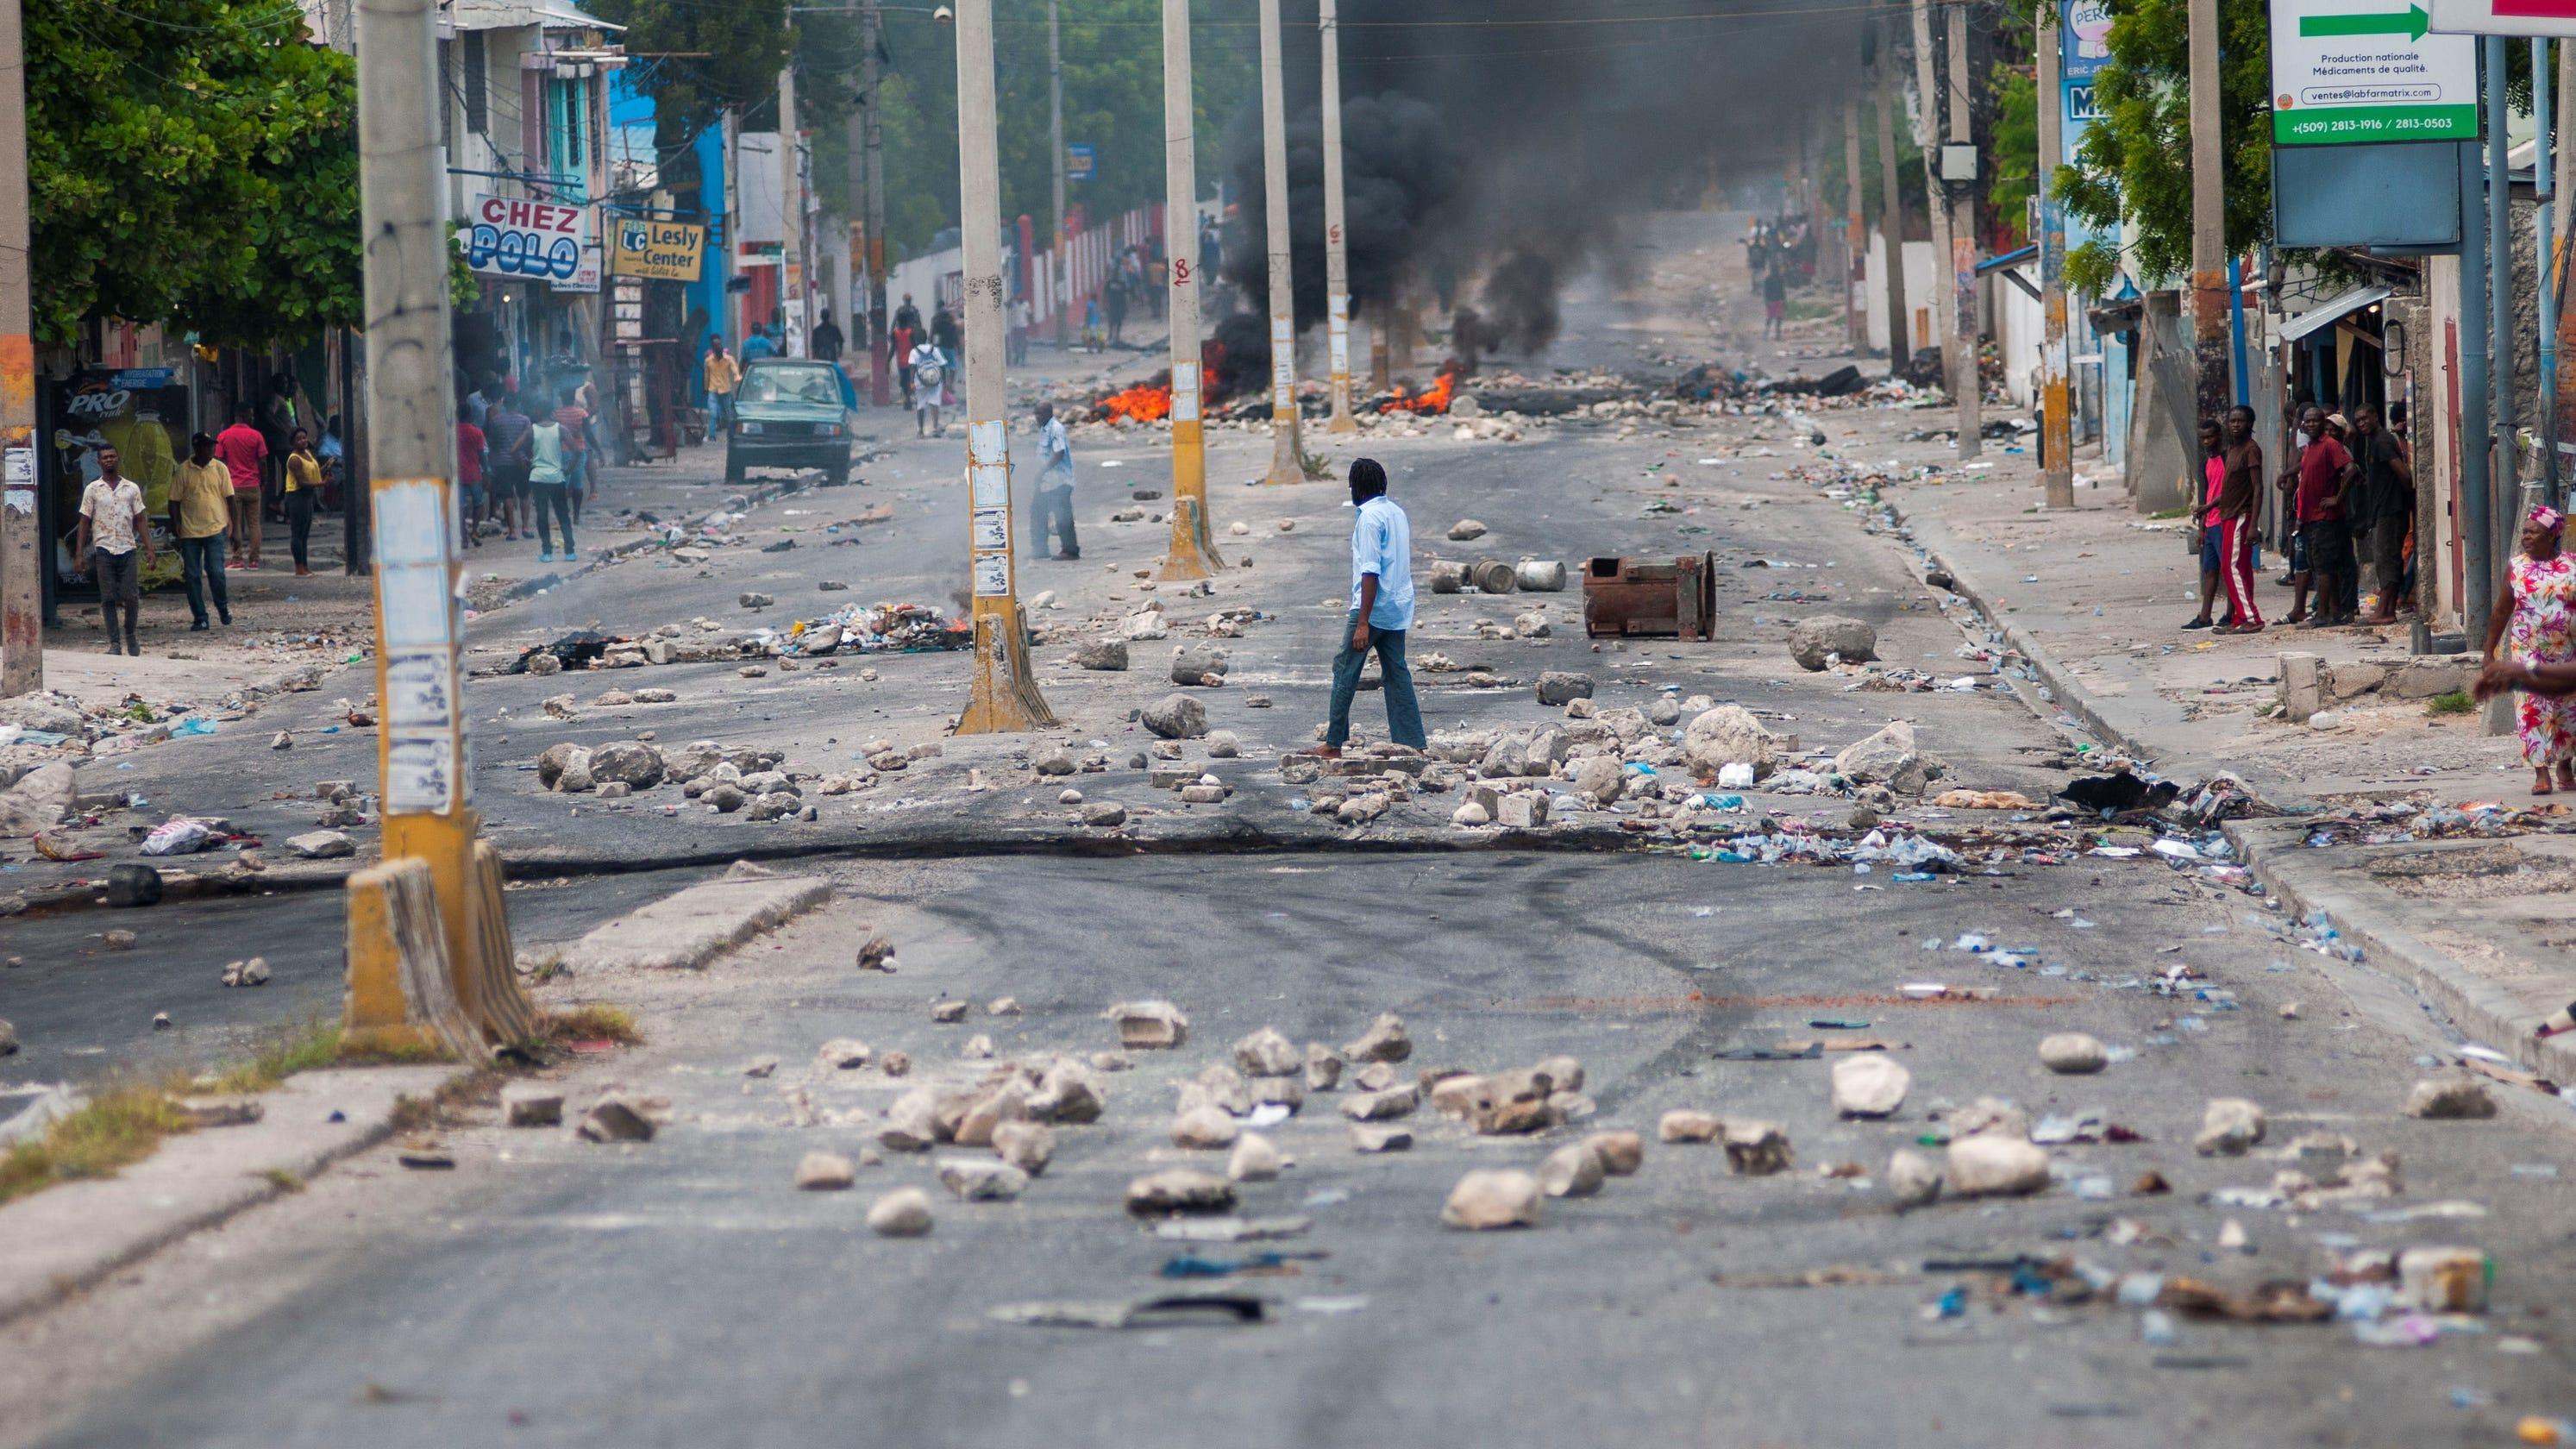 Haiti- The world is closing its eyes to the humanitarian calamity